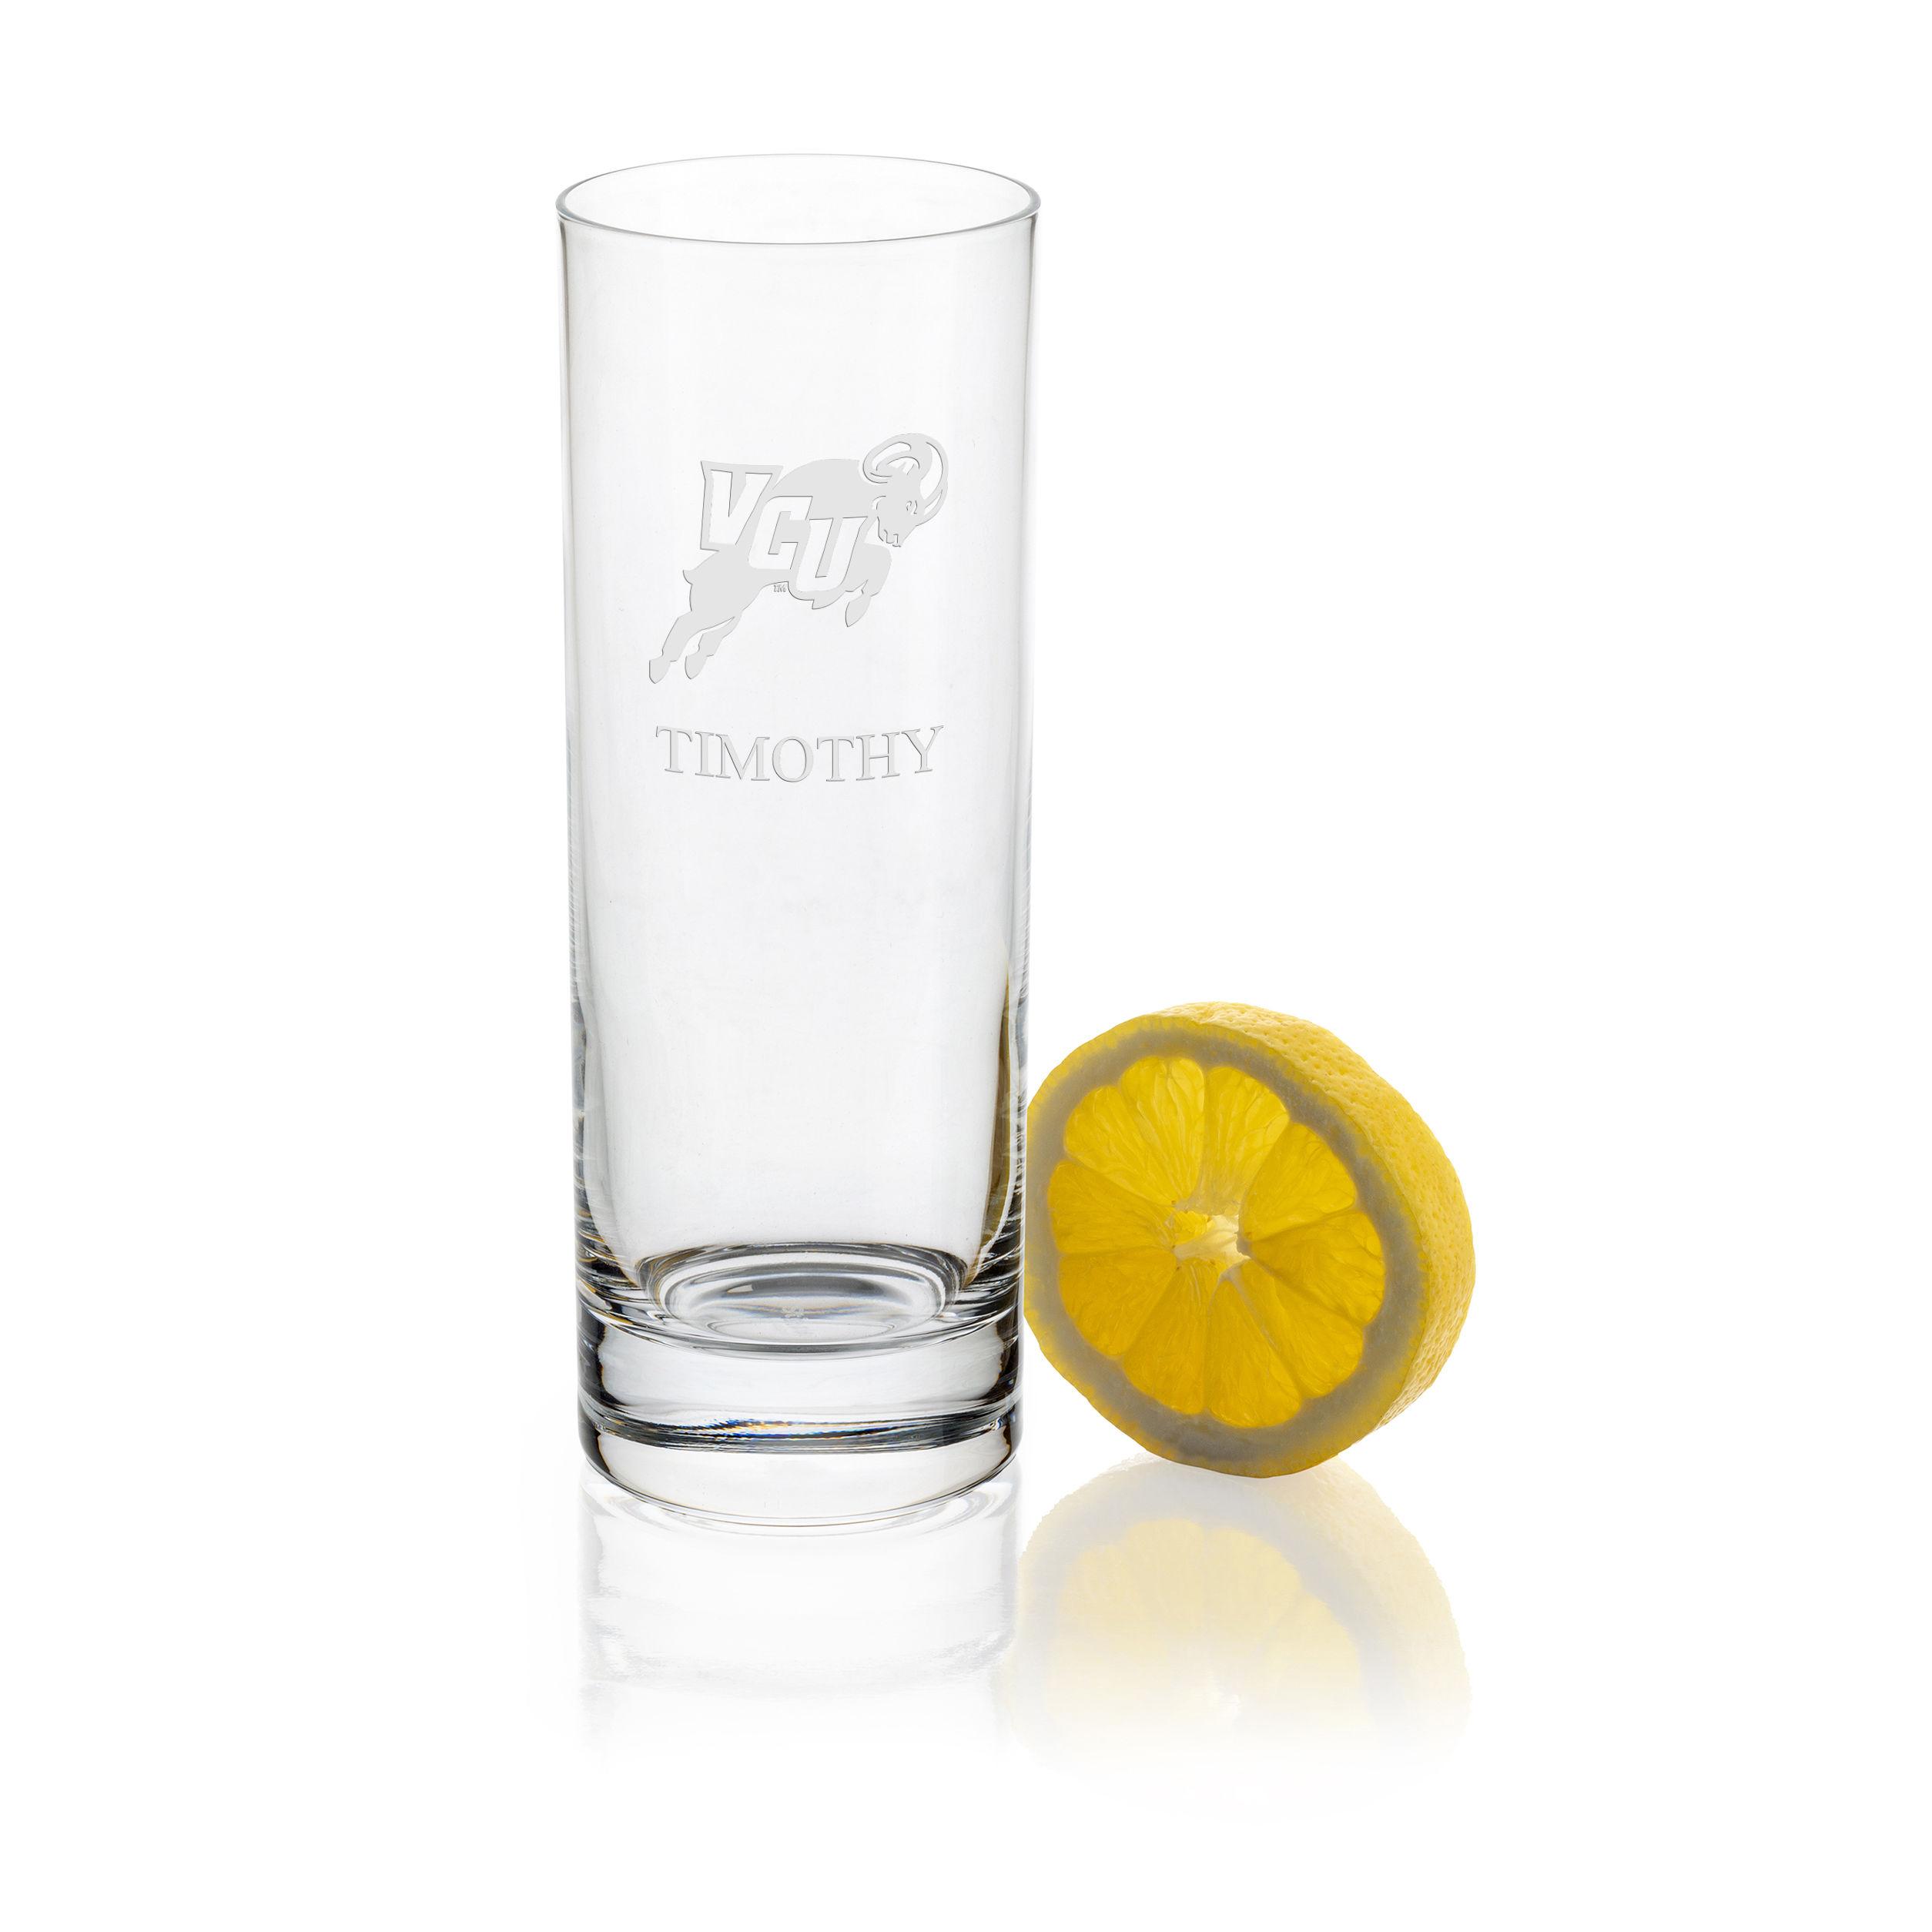 Virginia Commonwealth University Iced Beverage Glasses - Set of 2